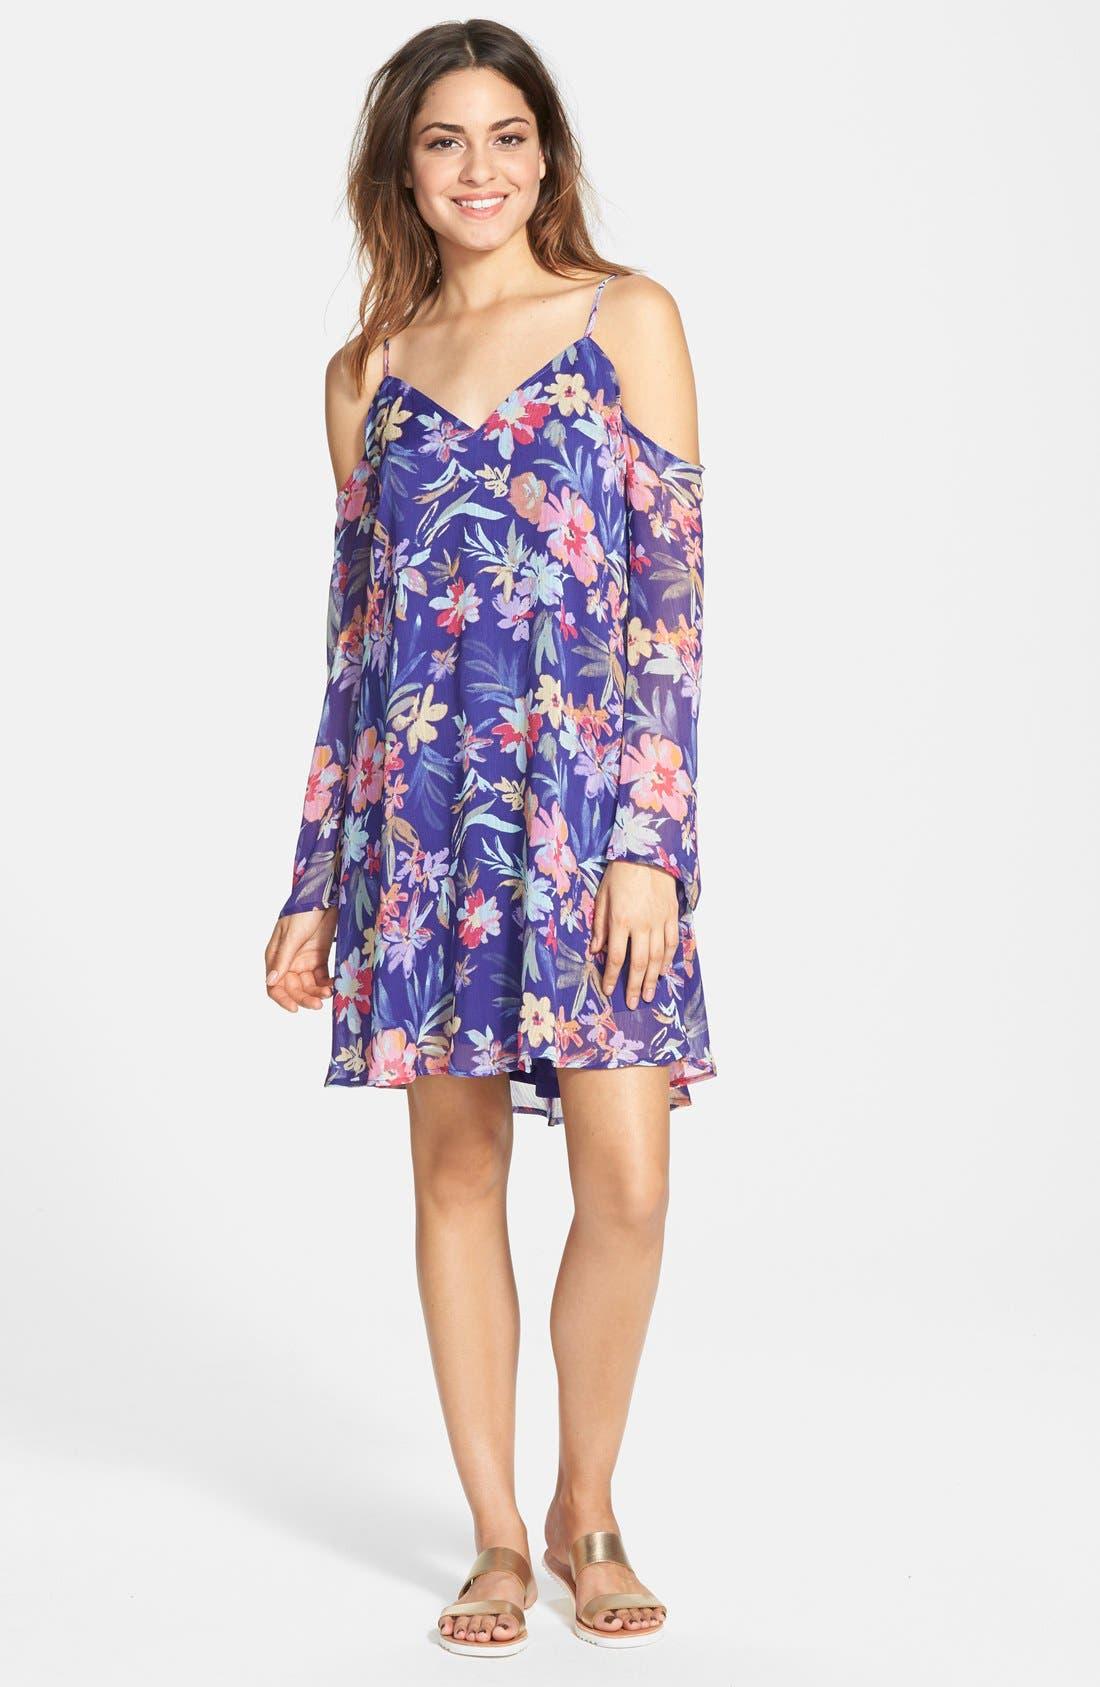 Main Image - Fire Floral Print Chiffon Cold Shoulder Dress (Juniors)